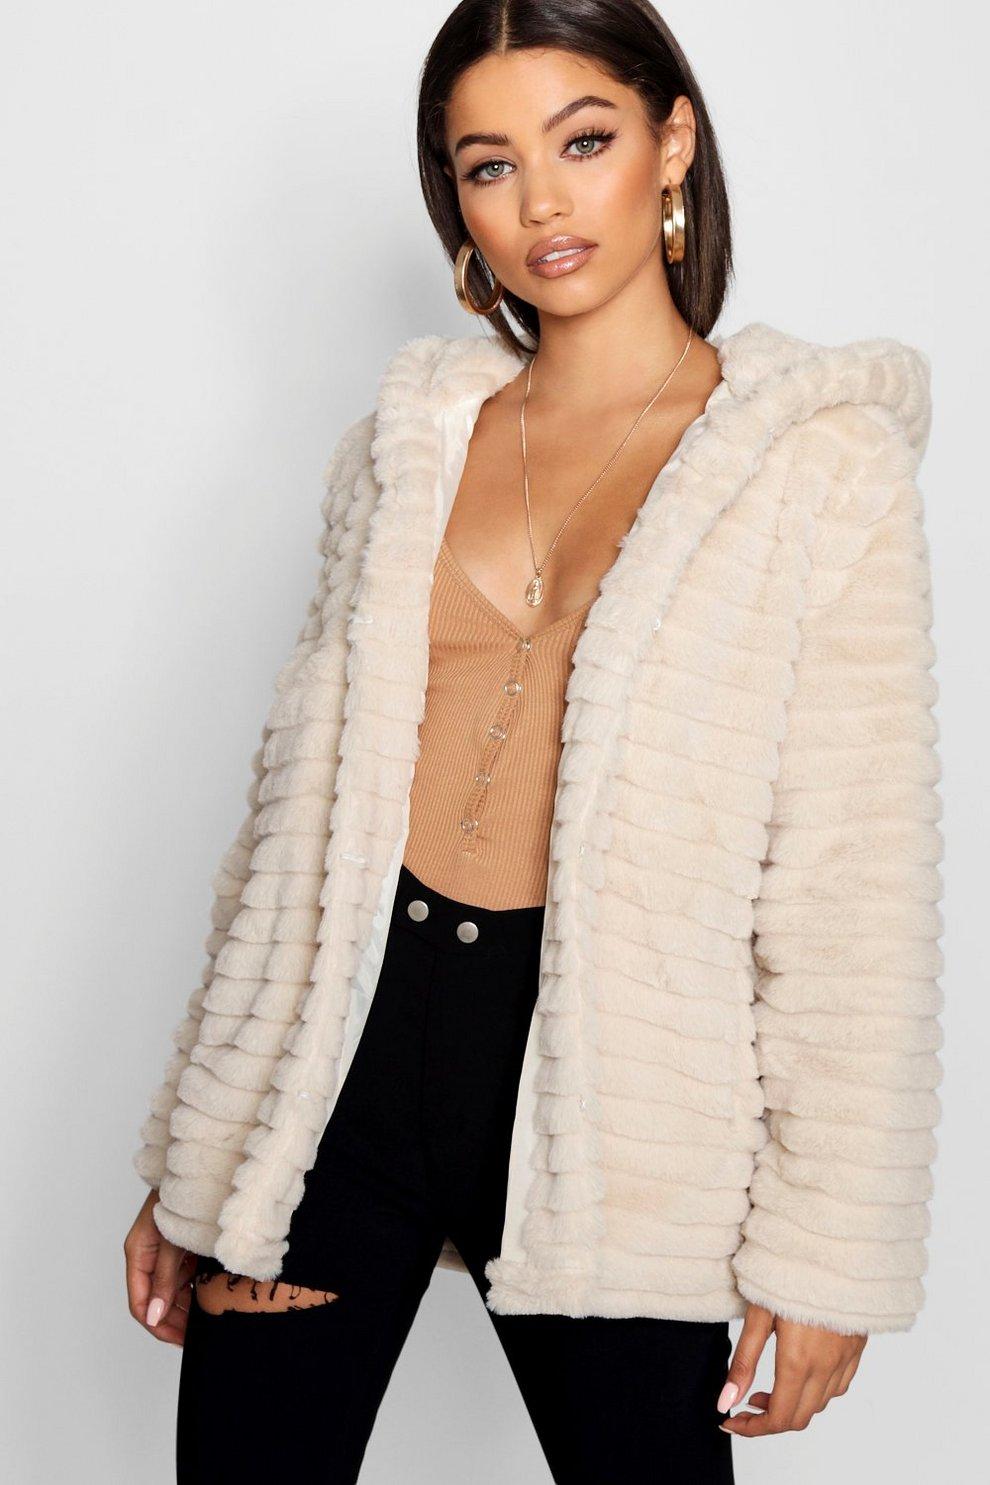 a95d51305095d Womens Cream Hooded Faux Fur Coat